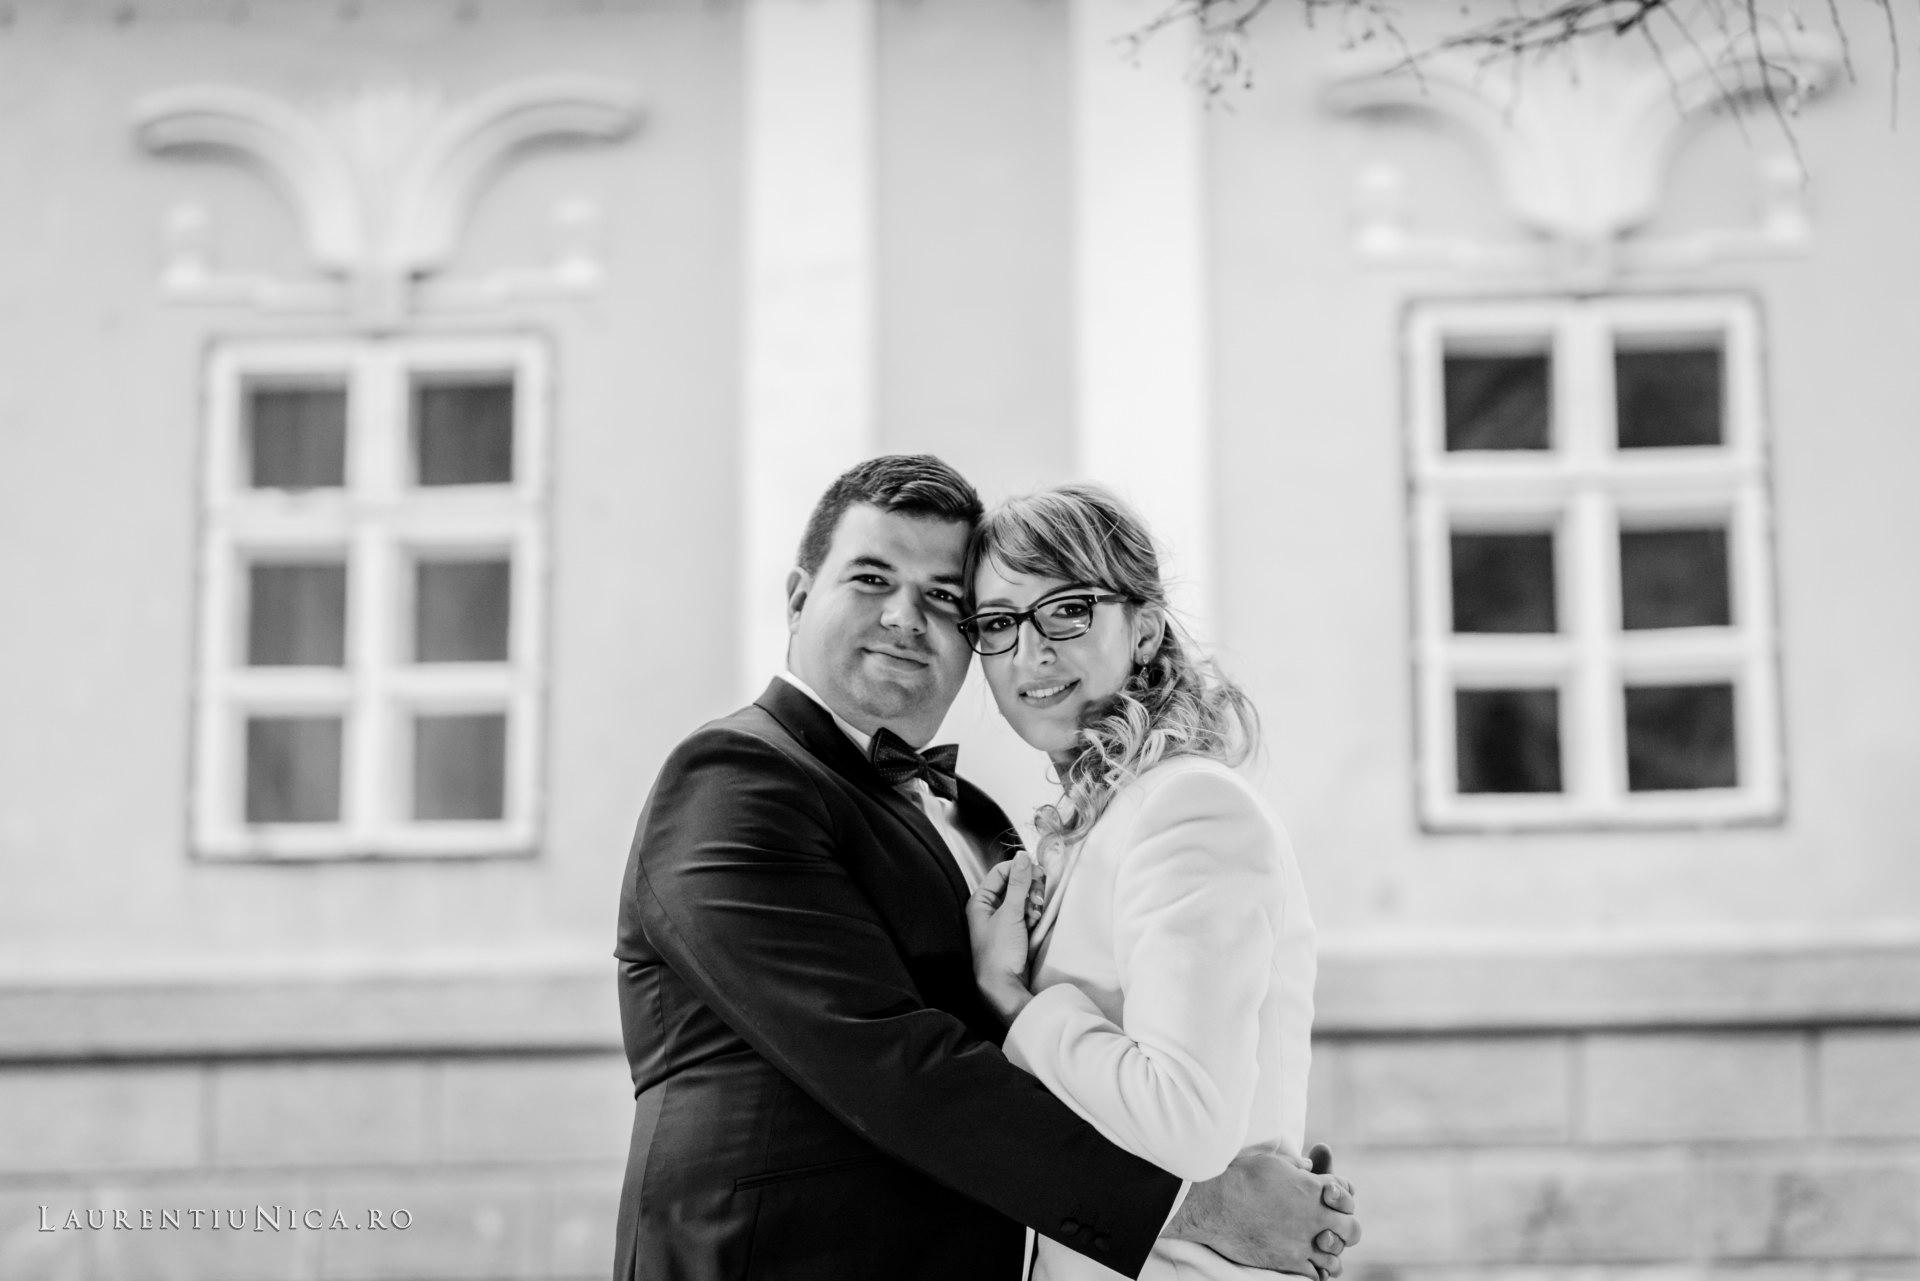 iulia-si-cosmin-fotografii-after-wedding-brasov-laurentiu-nica33